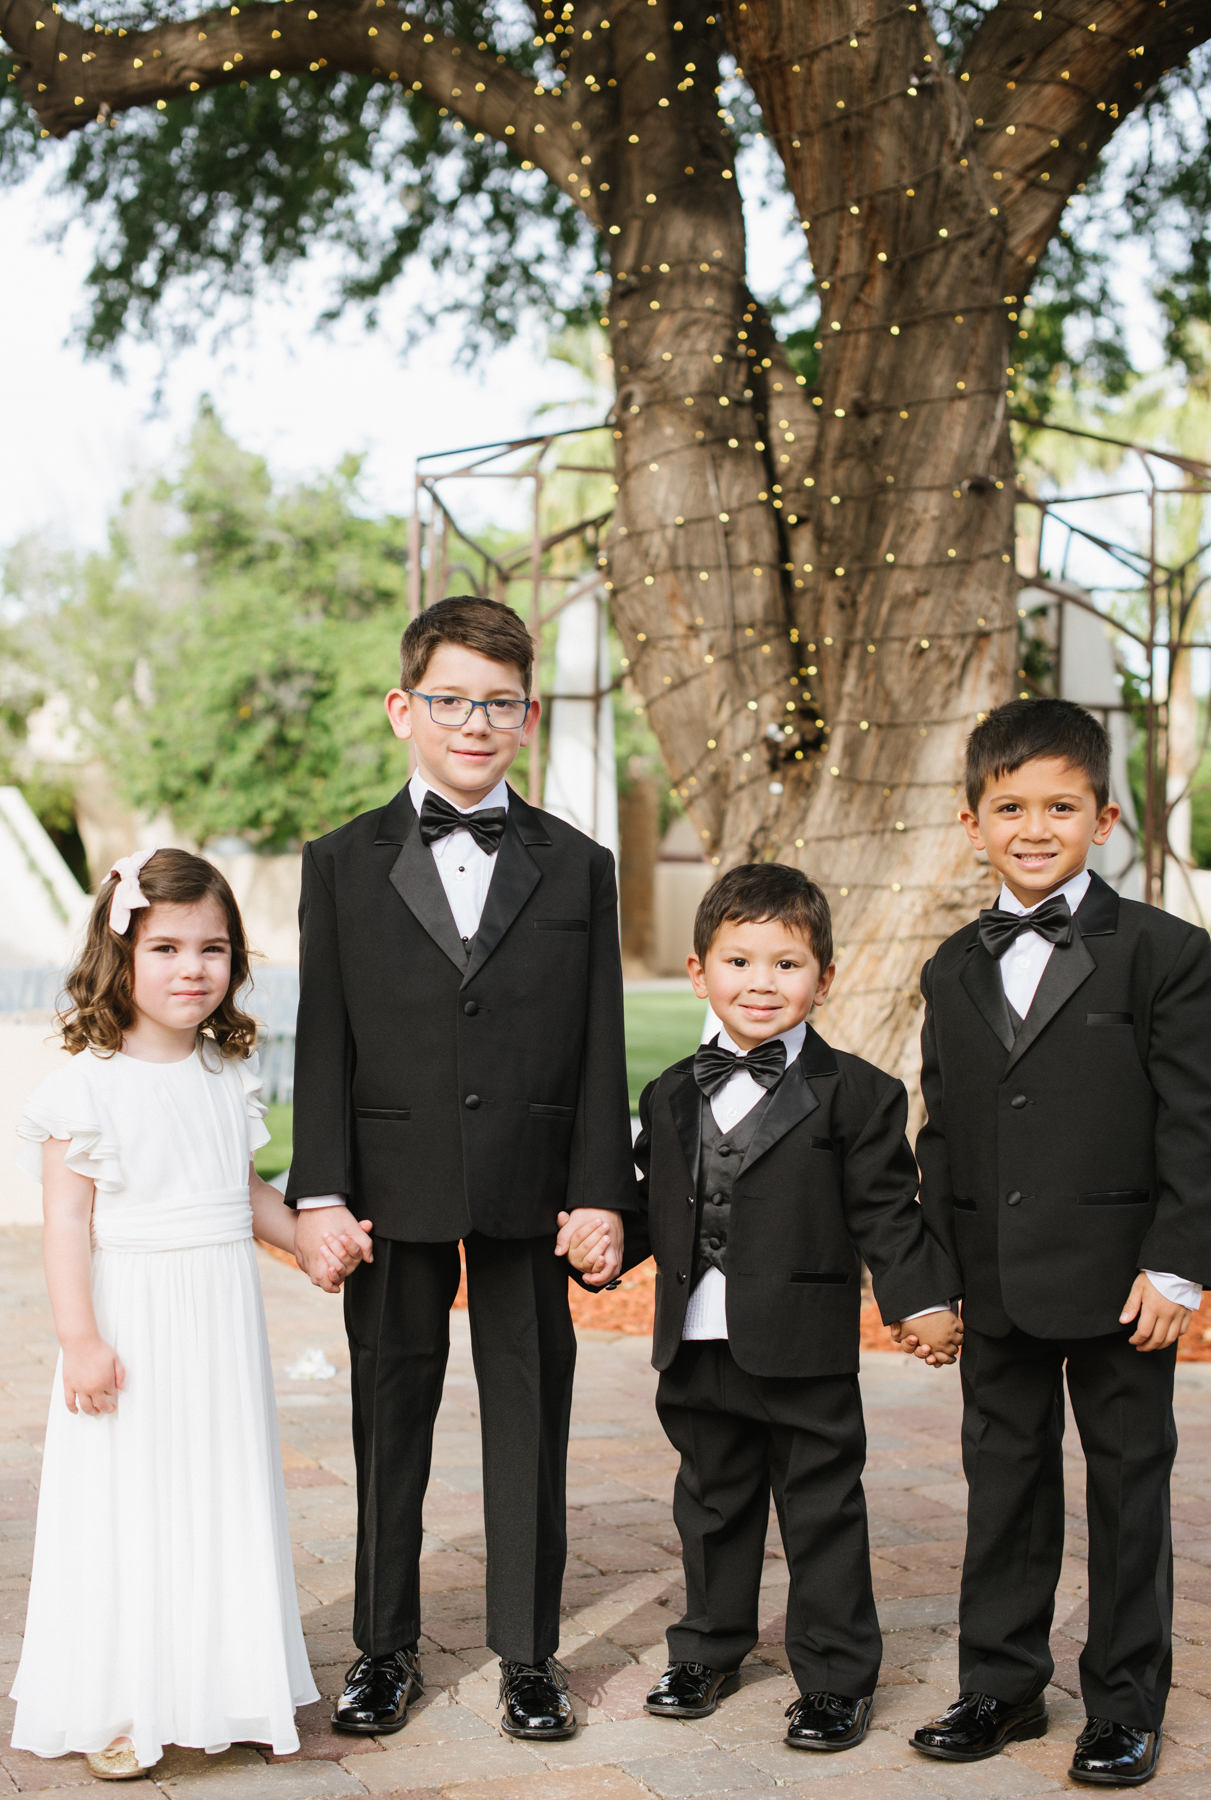 Secret Garden Event Center Wedding - Meredith Amadee Photography-68.jpg